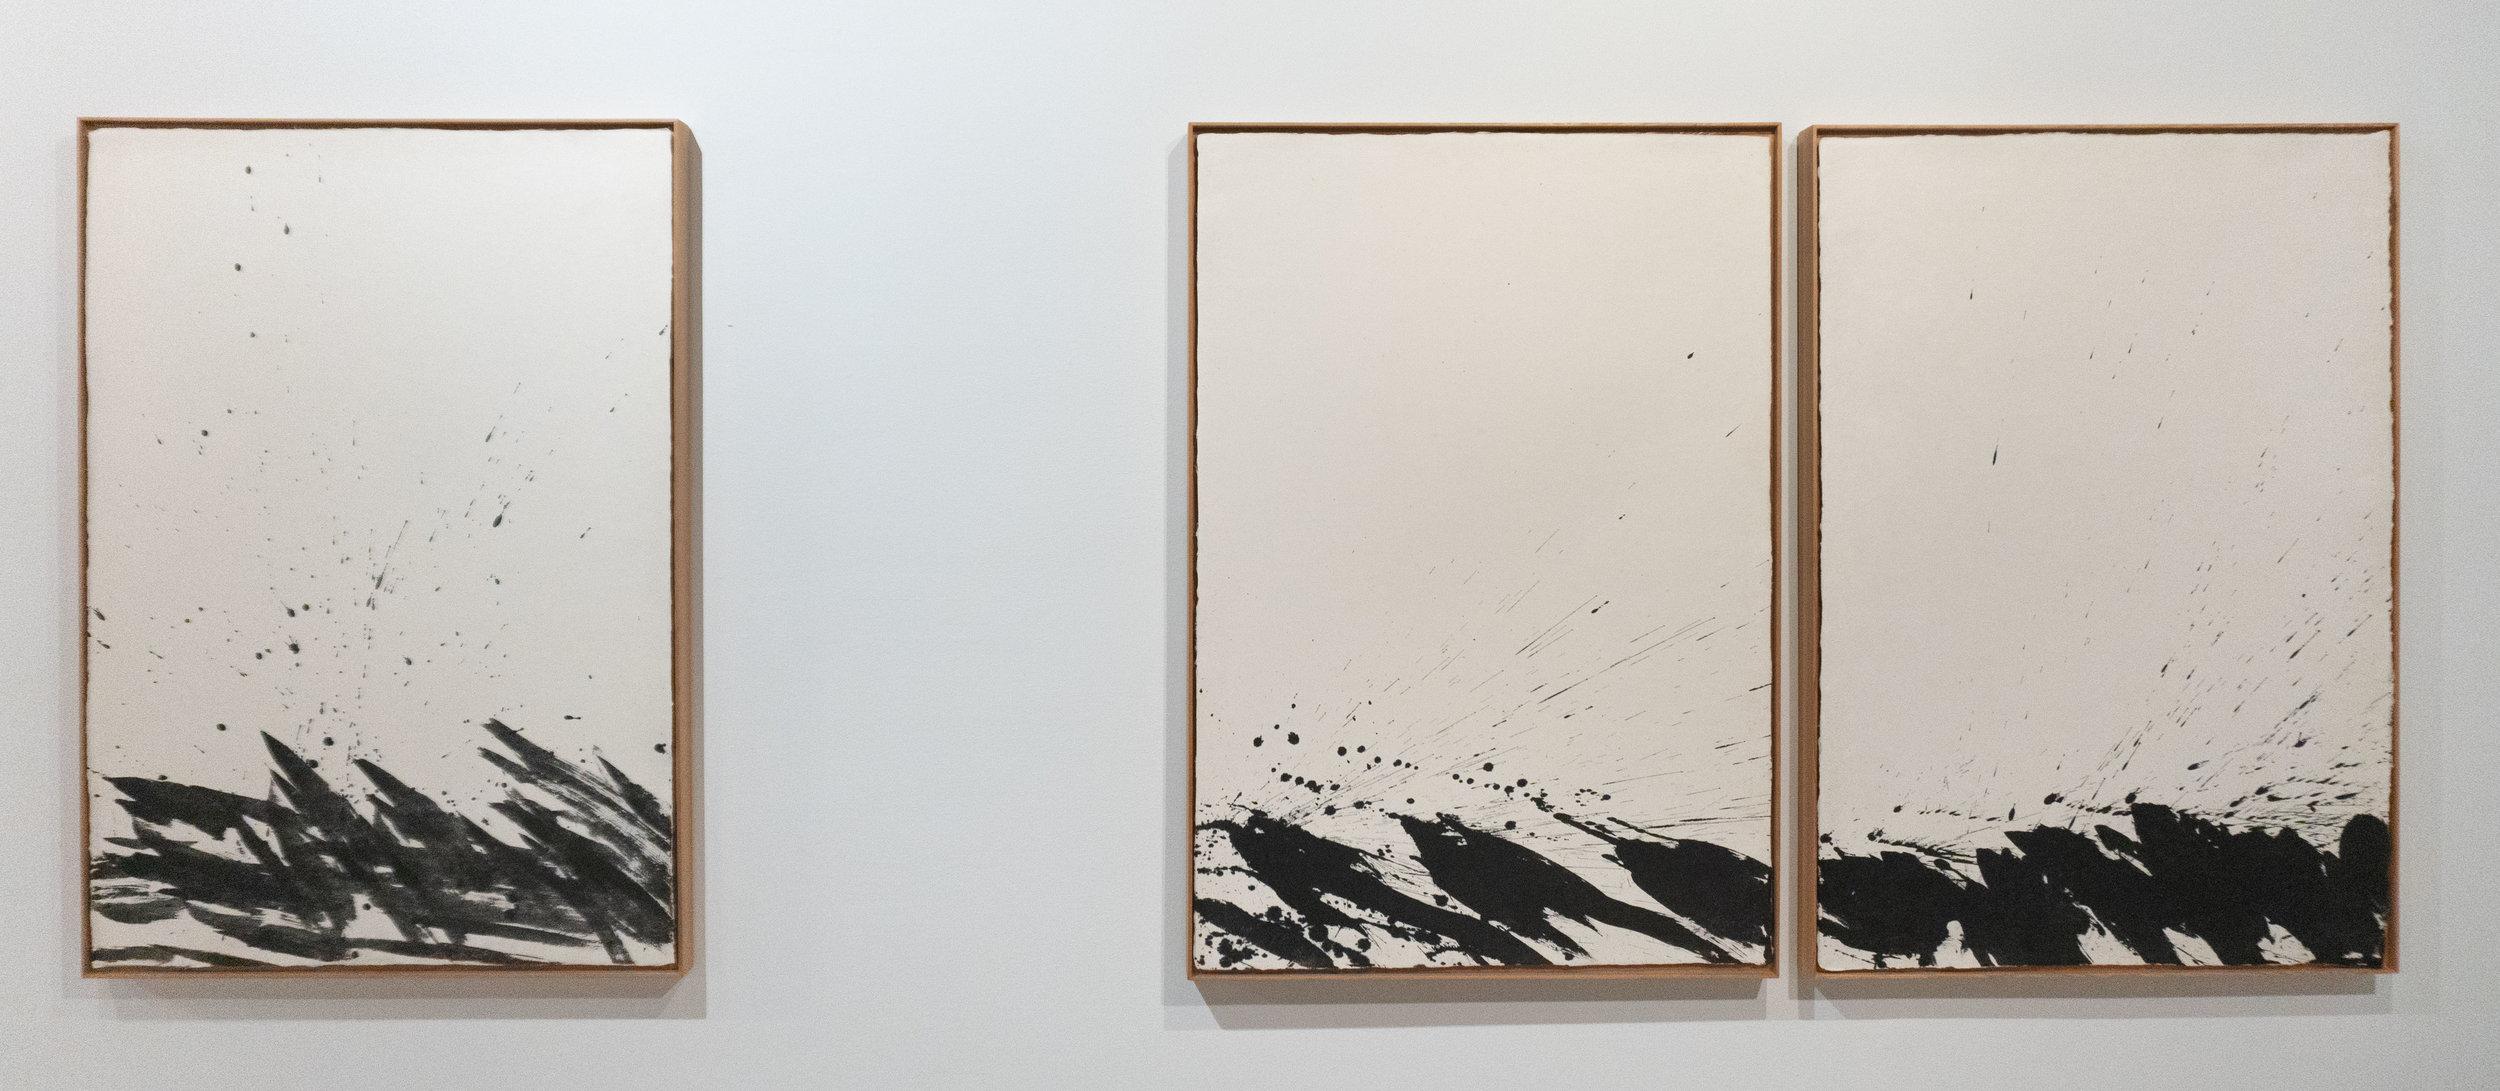 Lim Hyunrak 임현락 b. 1963   The Wind is Rising 바람이 일다 2015 Ink on Hanji paper each 27 ½ x 29 ⅜ in